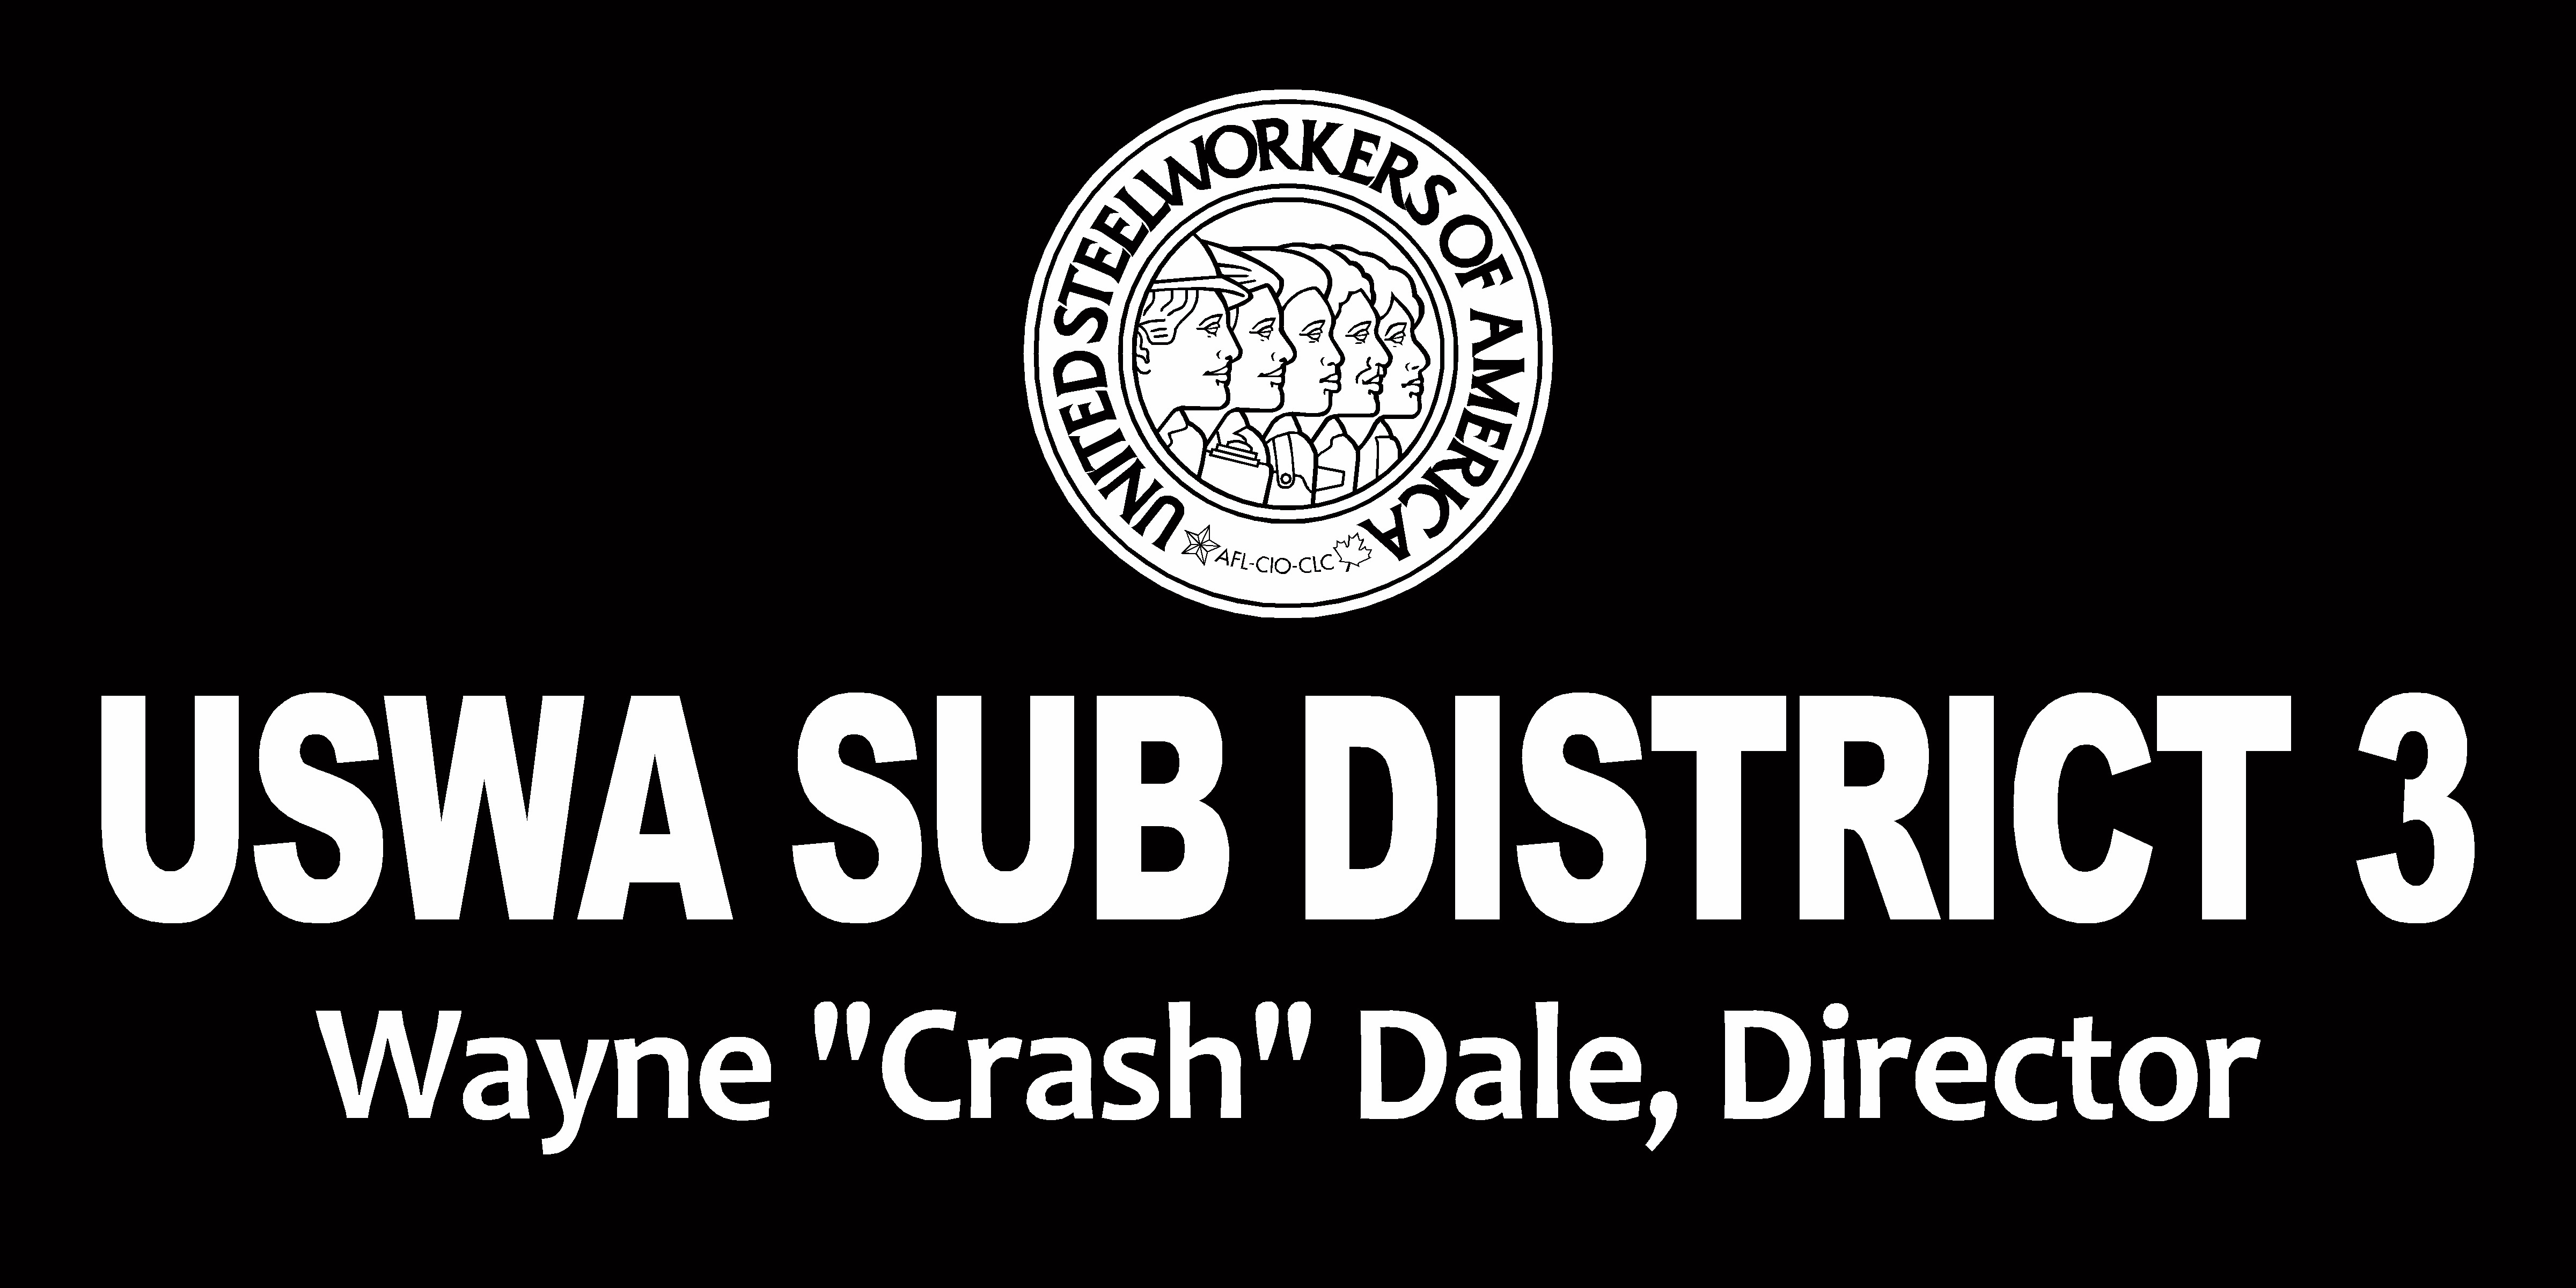 USW Sub District #3